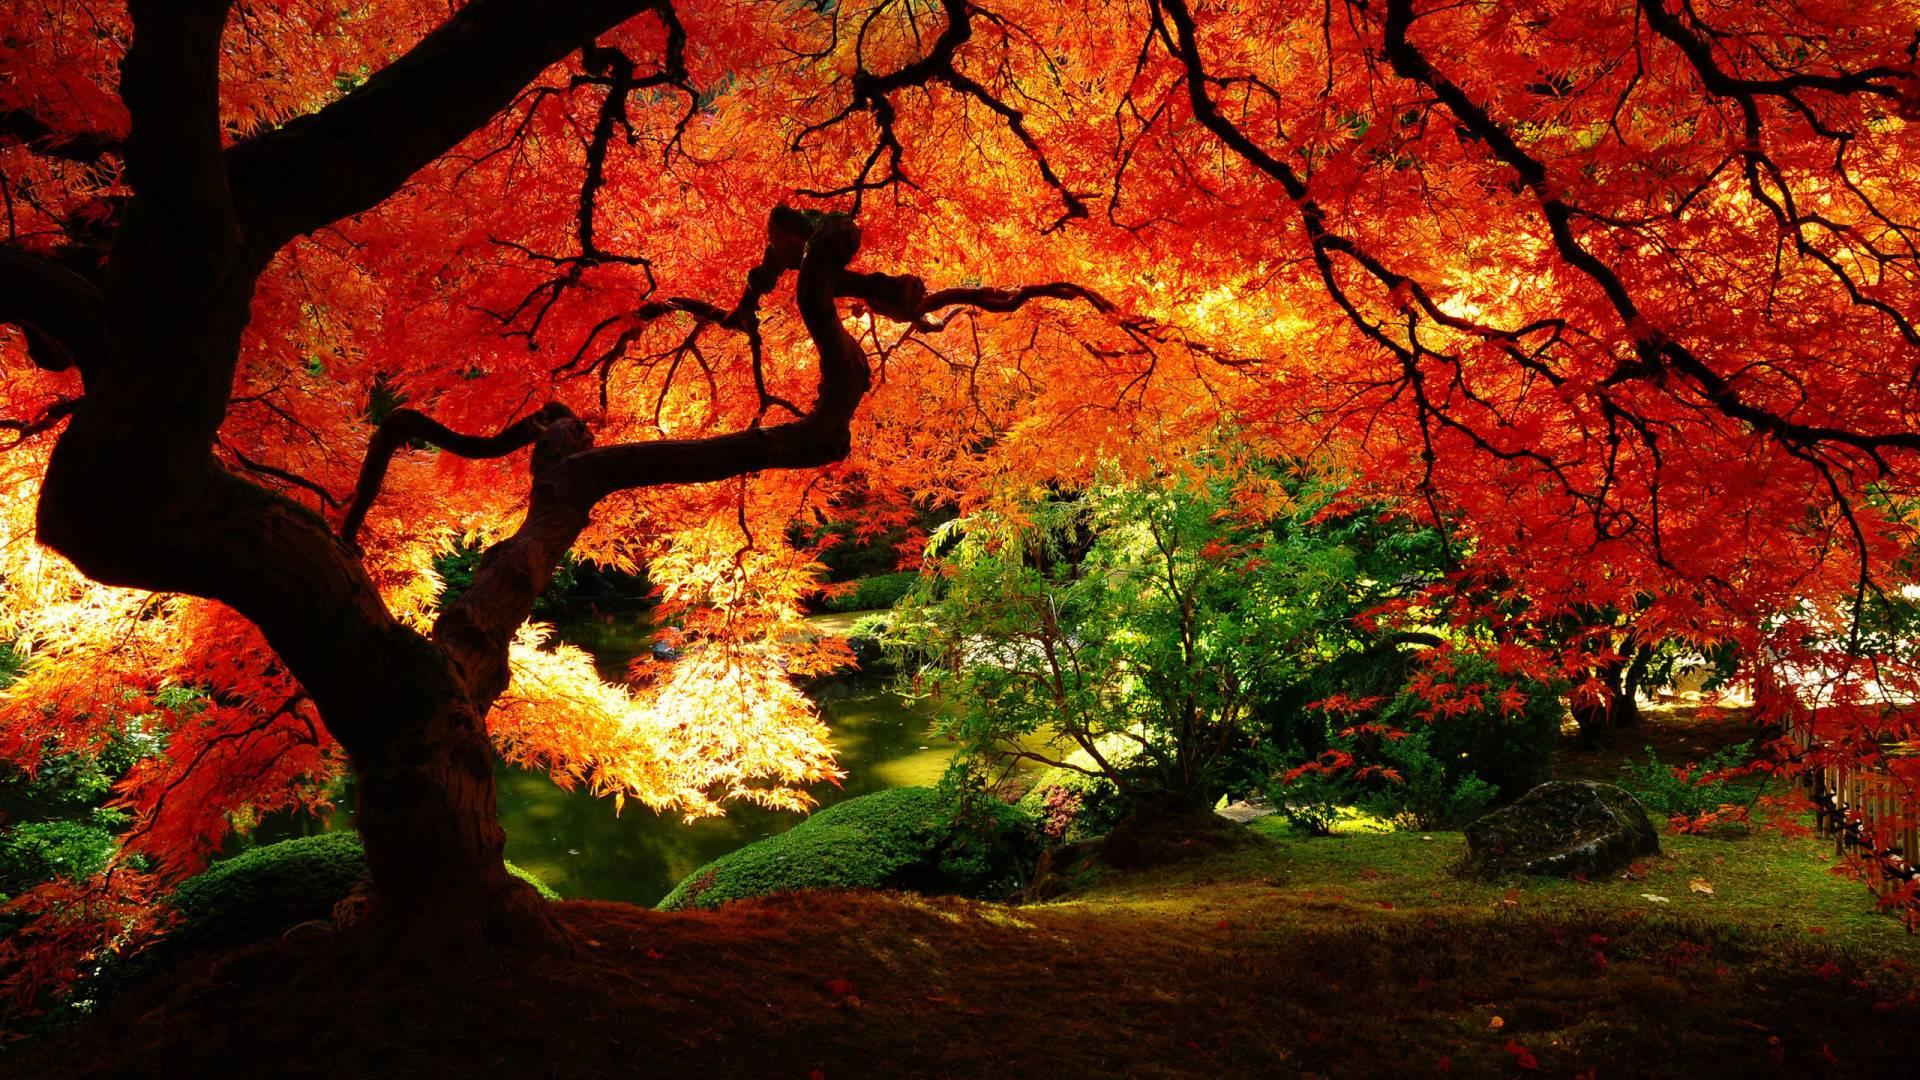 Japanese garden wallpaper - Japanese Garden Wallpaper Night Amazing Design 413852 Inspiration